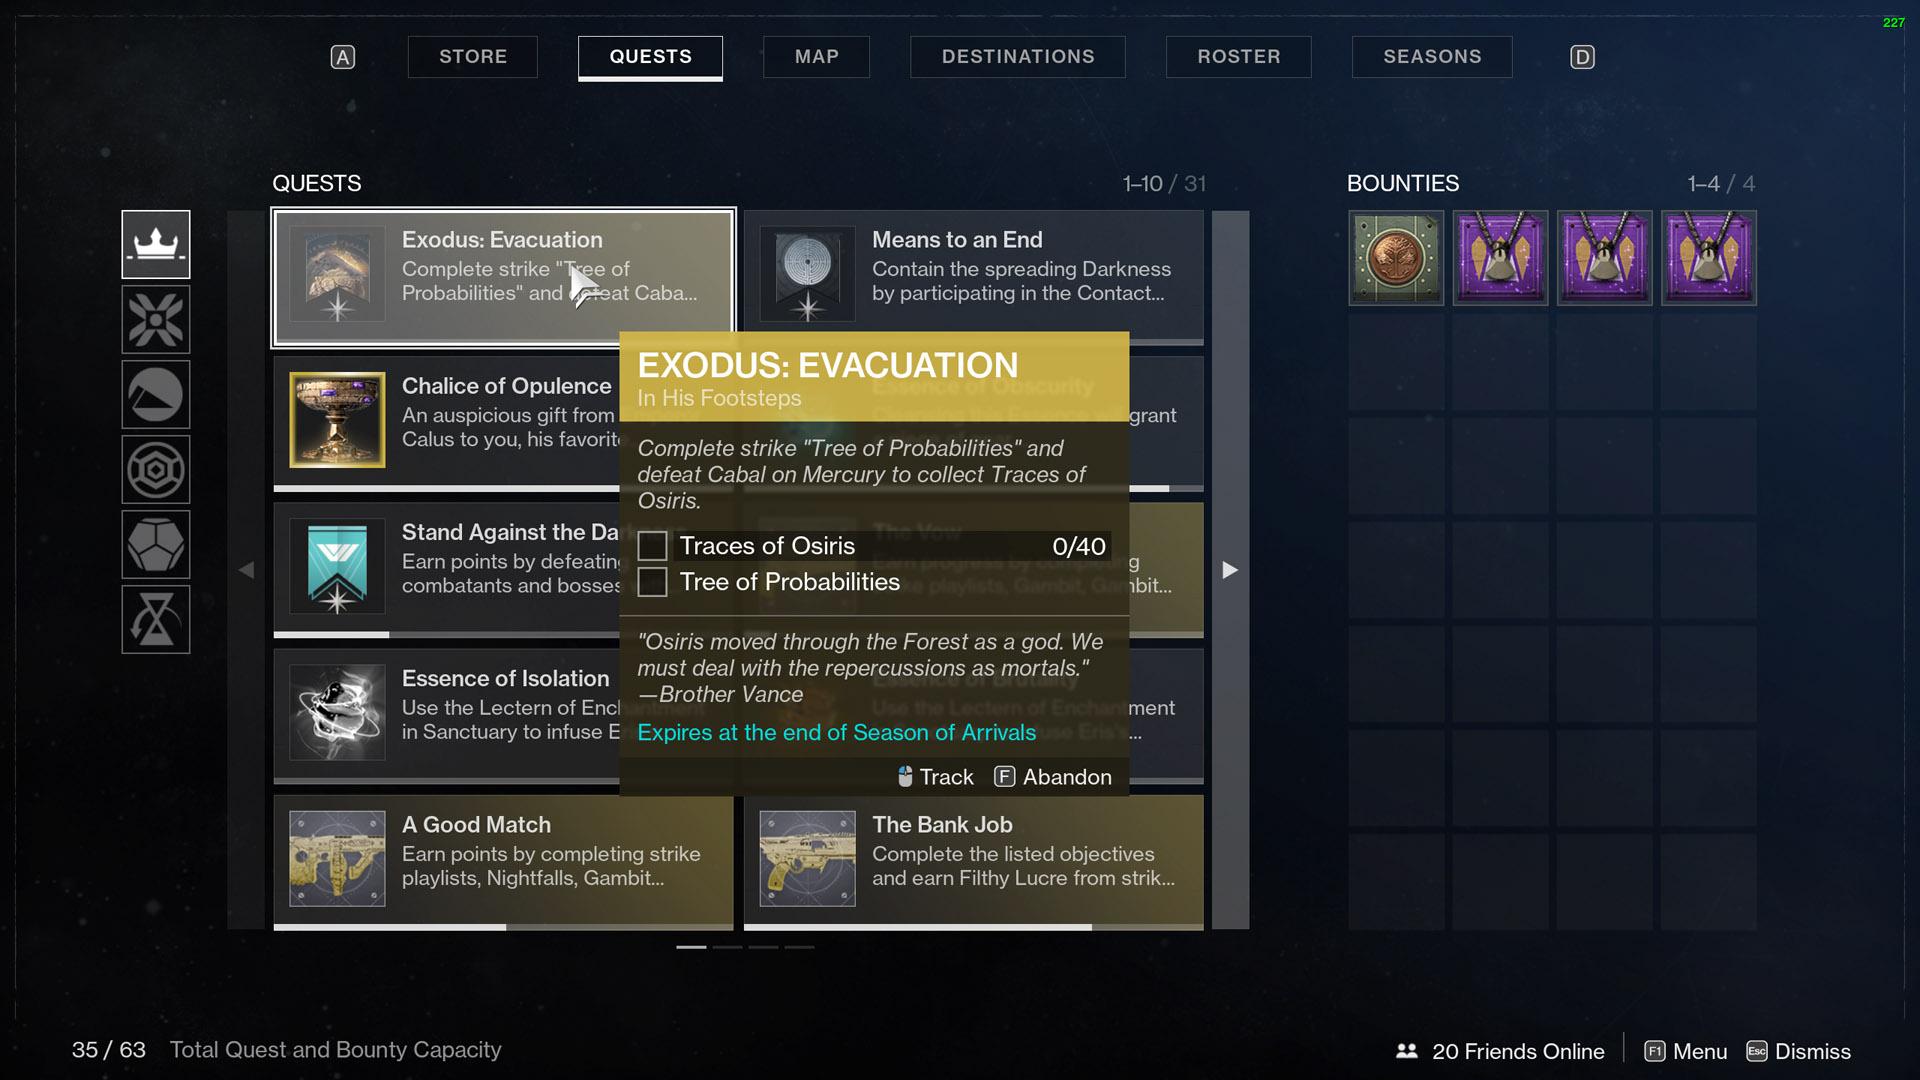 Destiny 2 Exodus Evacuation In His Footsteps